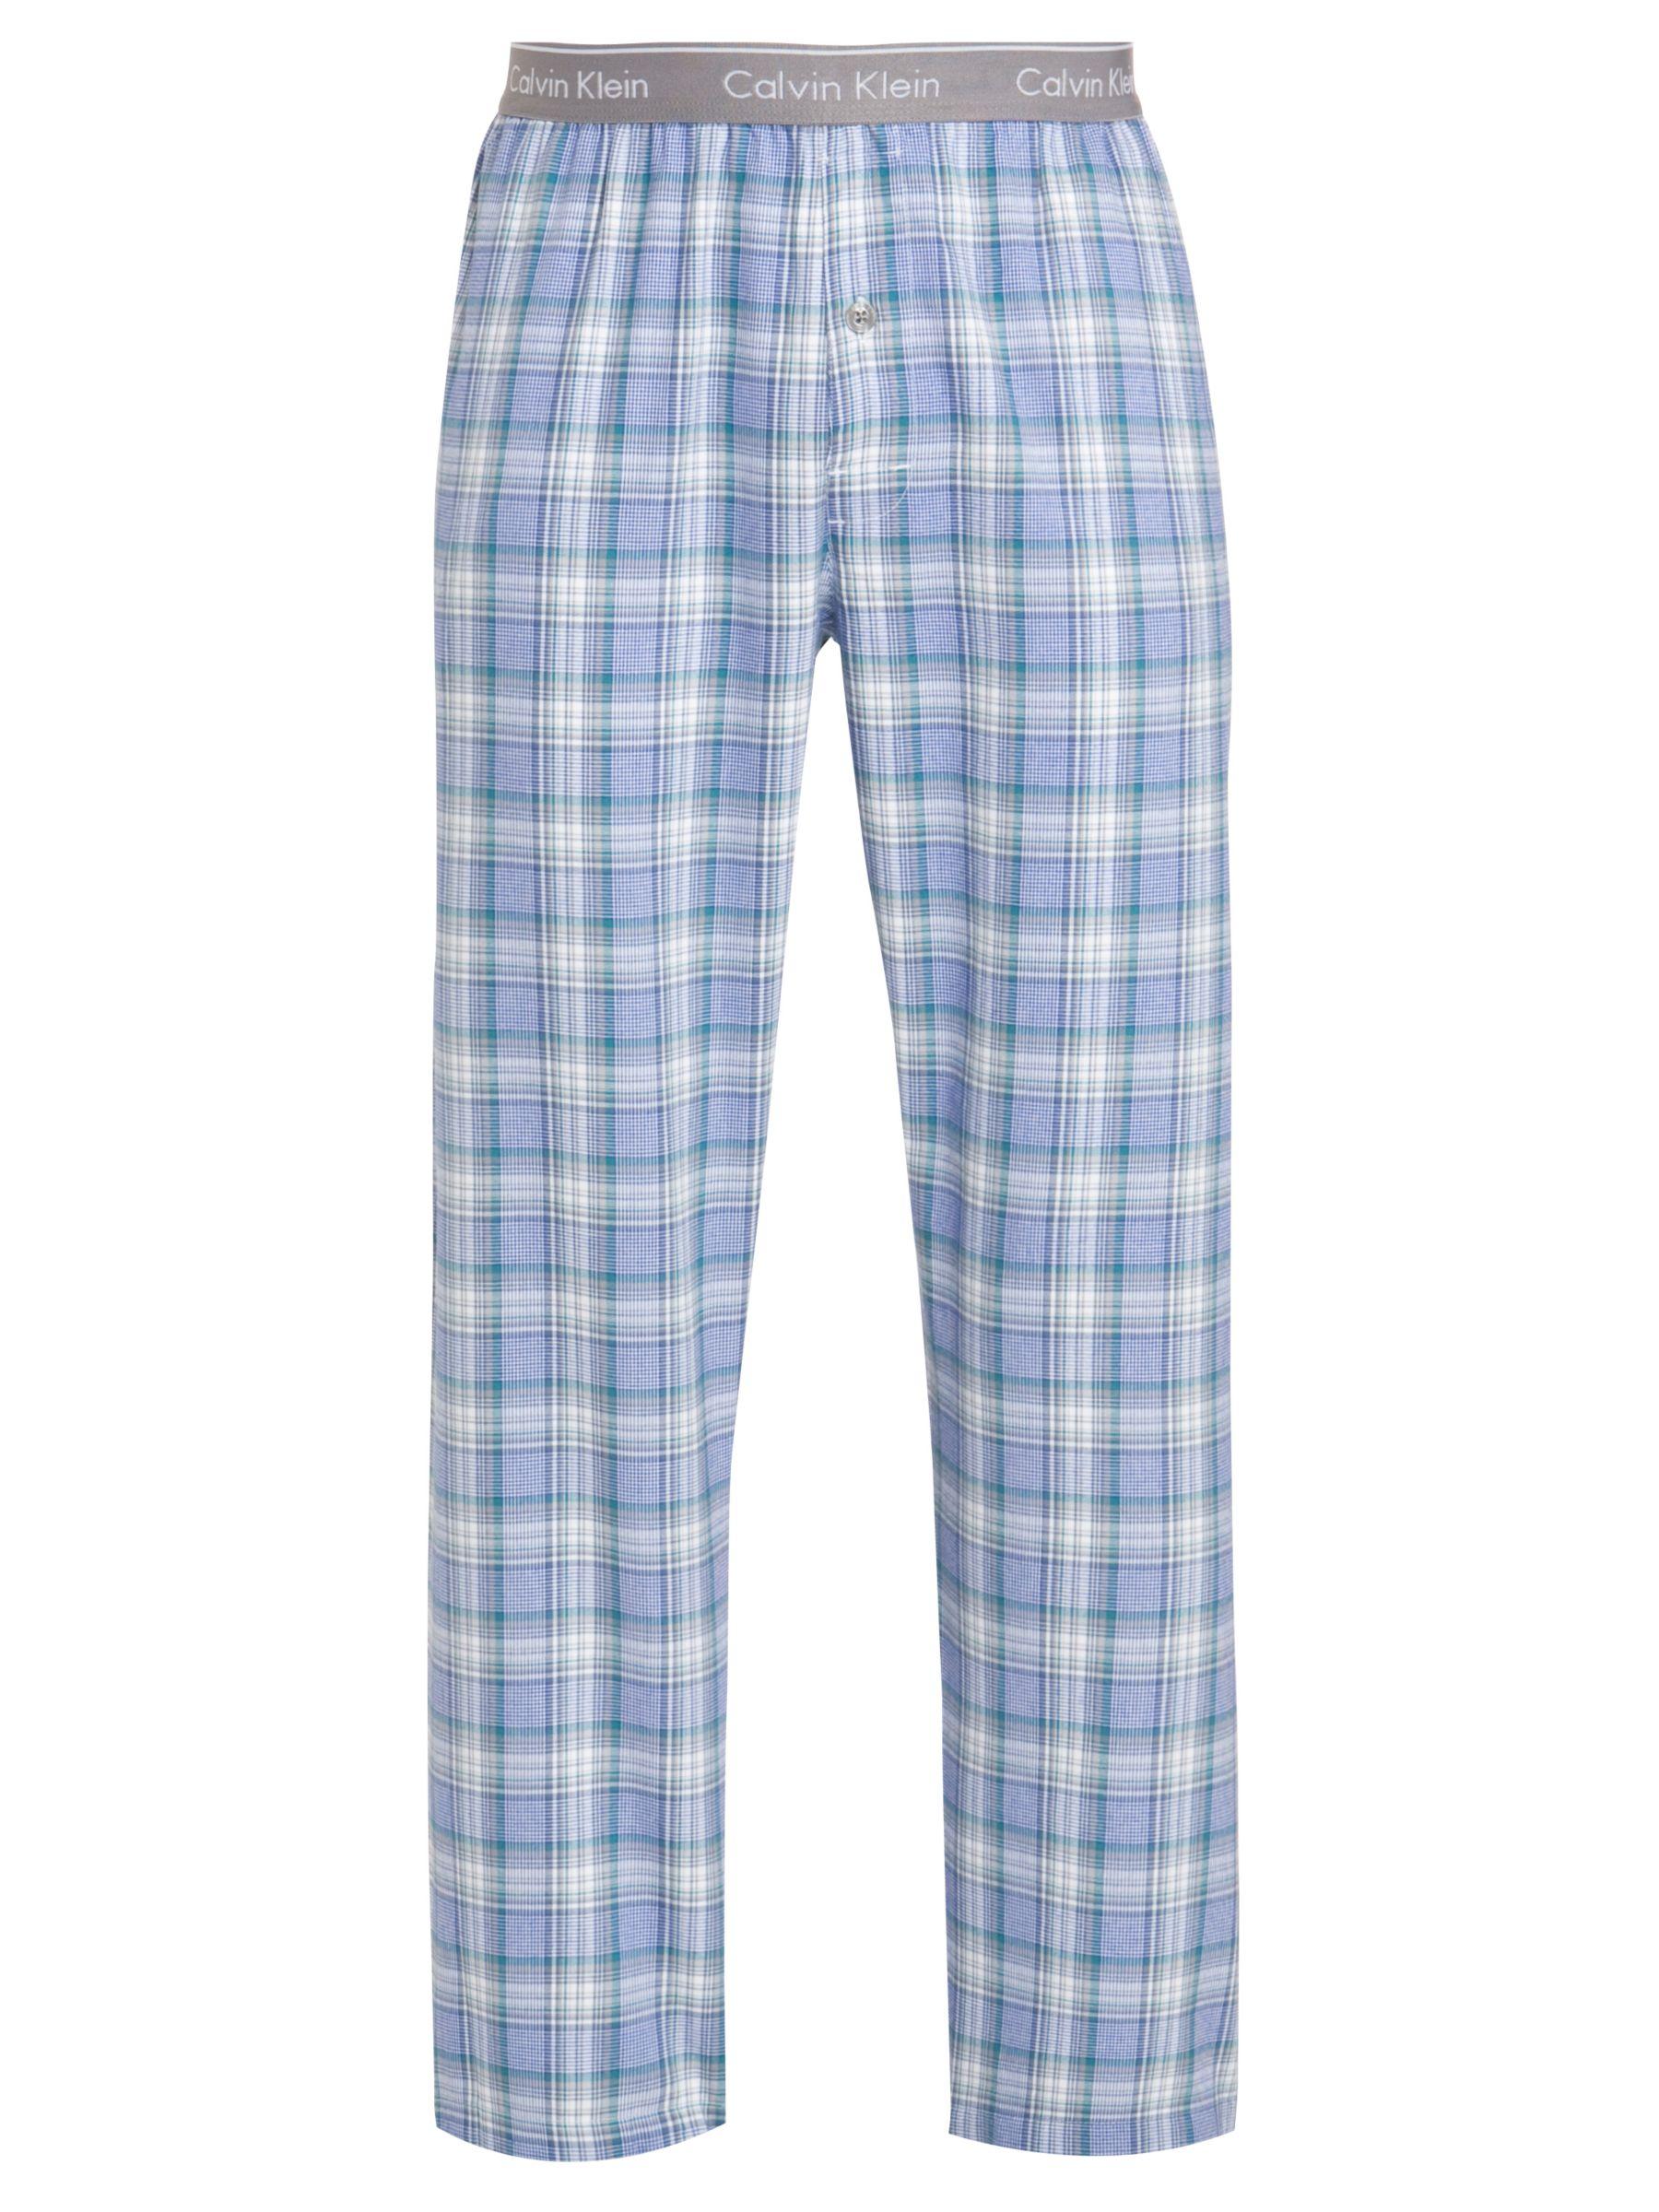 Calvin Klein Check Pyjama Pants, Blue/Green